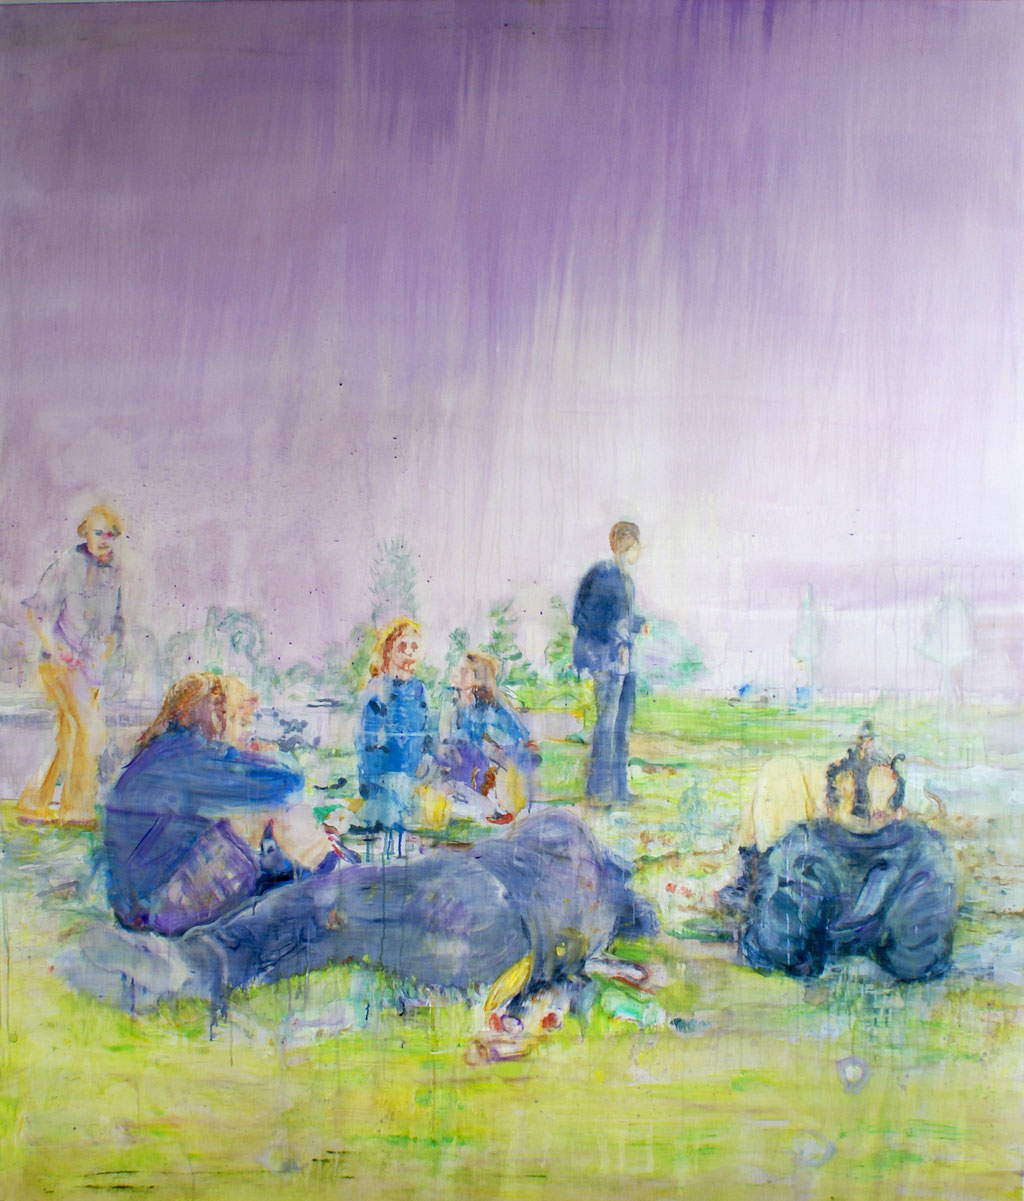 Meadow 200x160 cm Oil/Canvas 2009